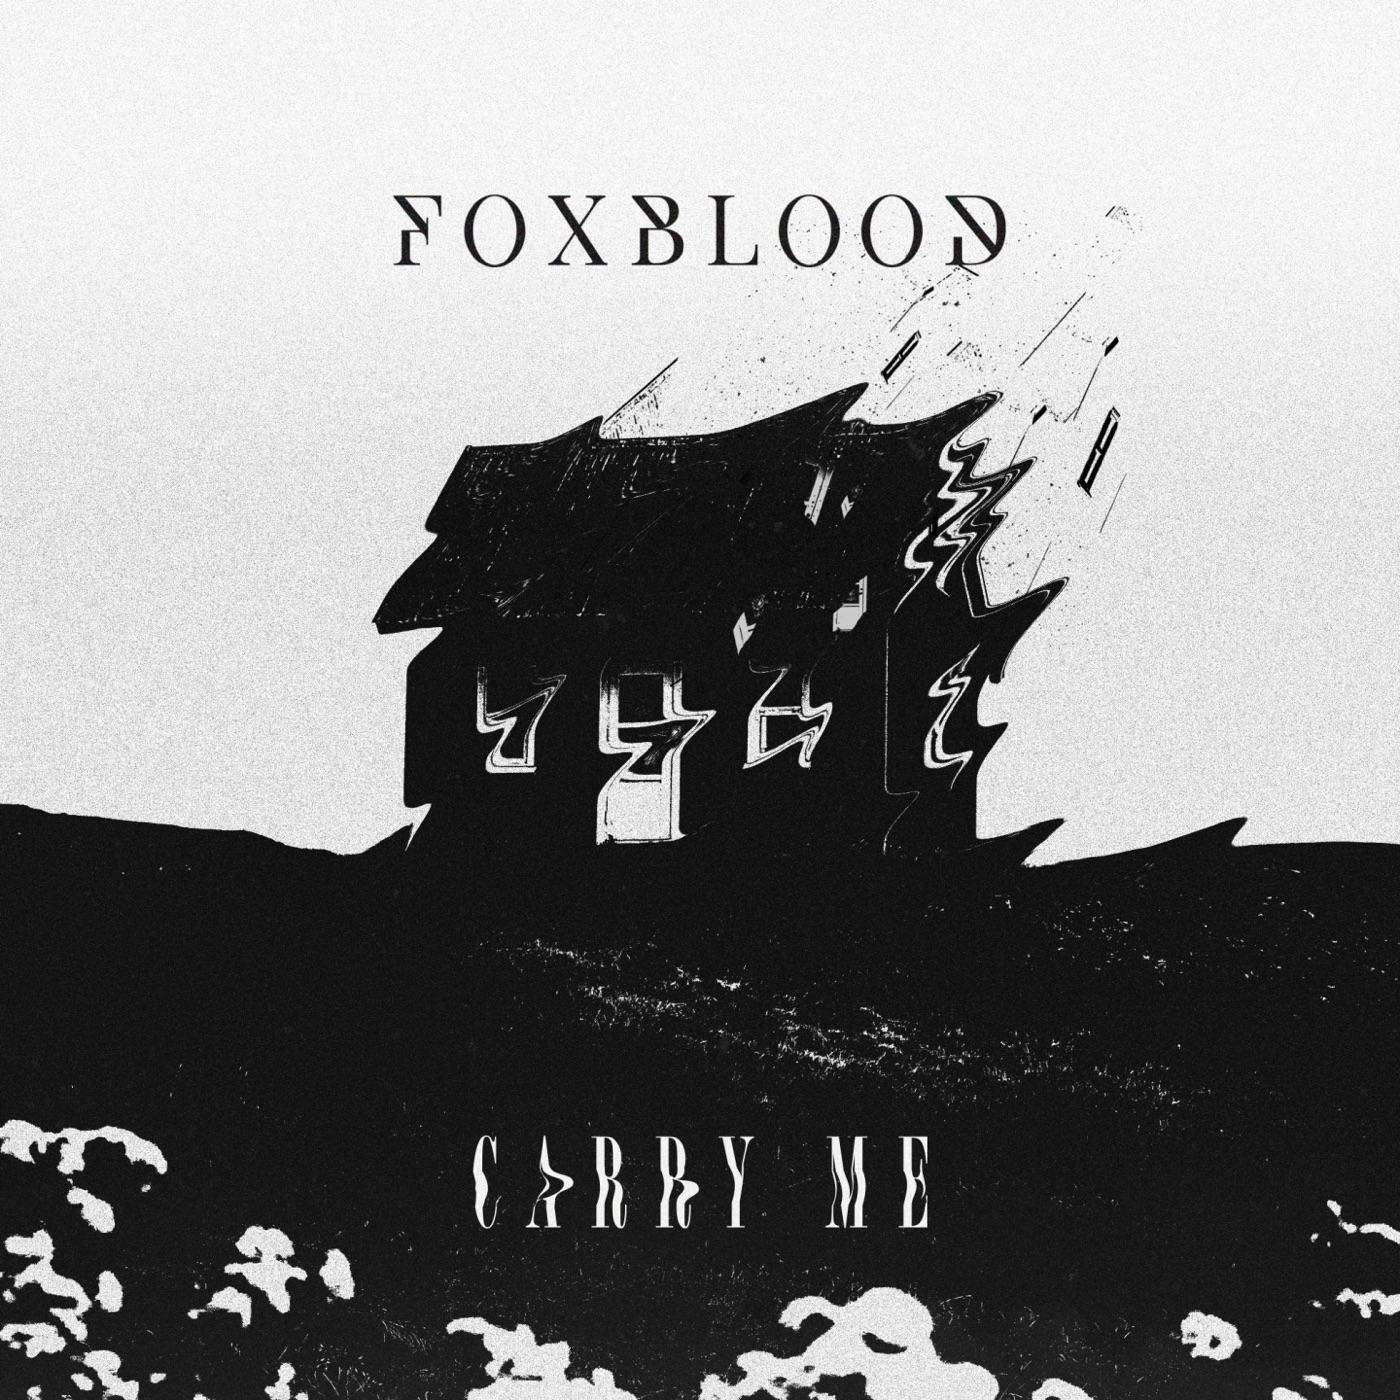 Foxblood - Carry Me [single] (2018)